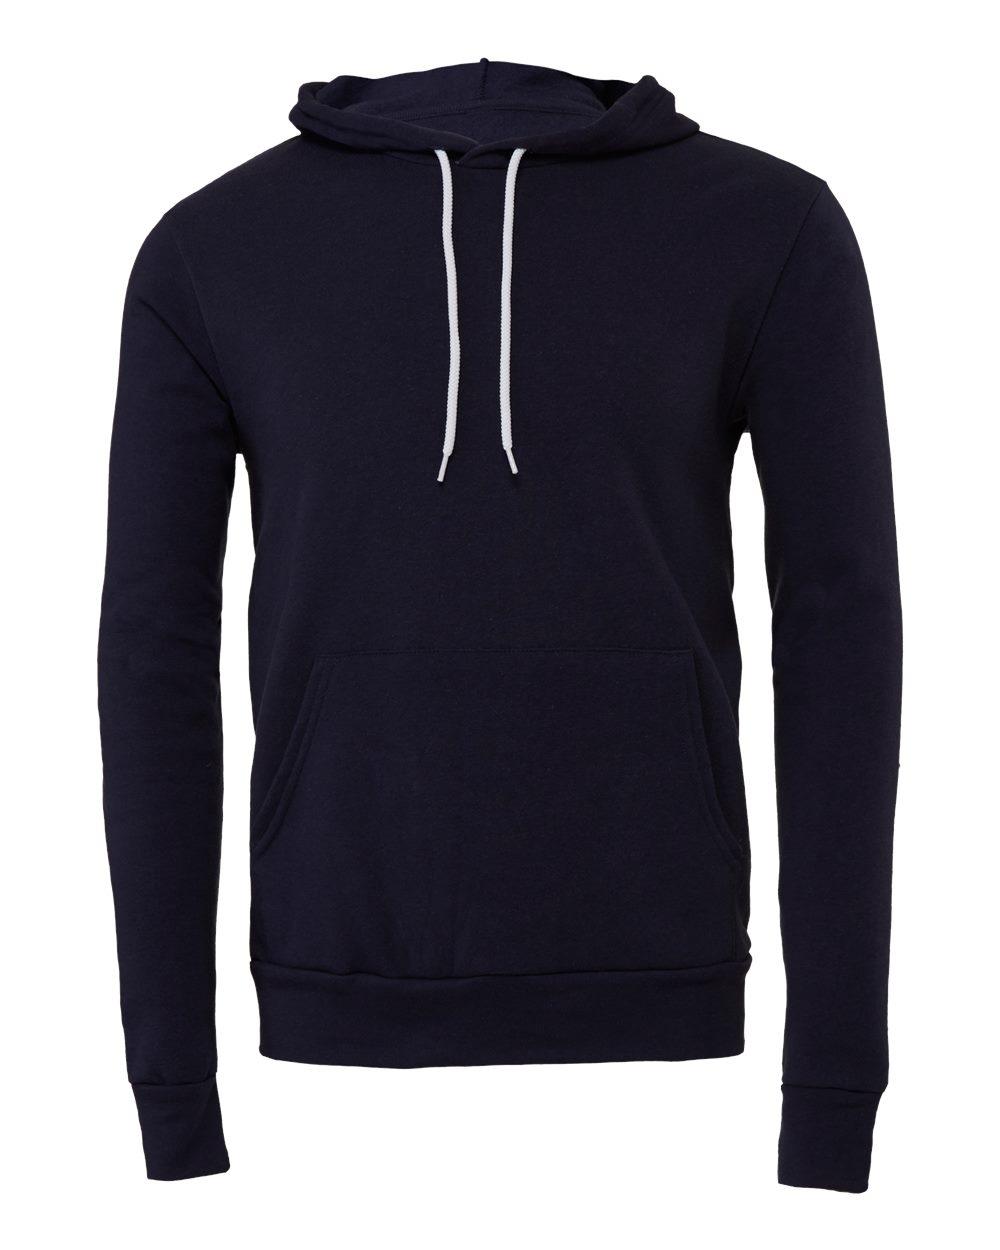 Bella-Canvas-Unisex-Sponge-Hooded-Pullover-Sweatshirt-Blank-3719-up-to-2XL thumbnail 79